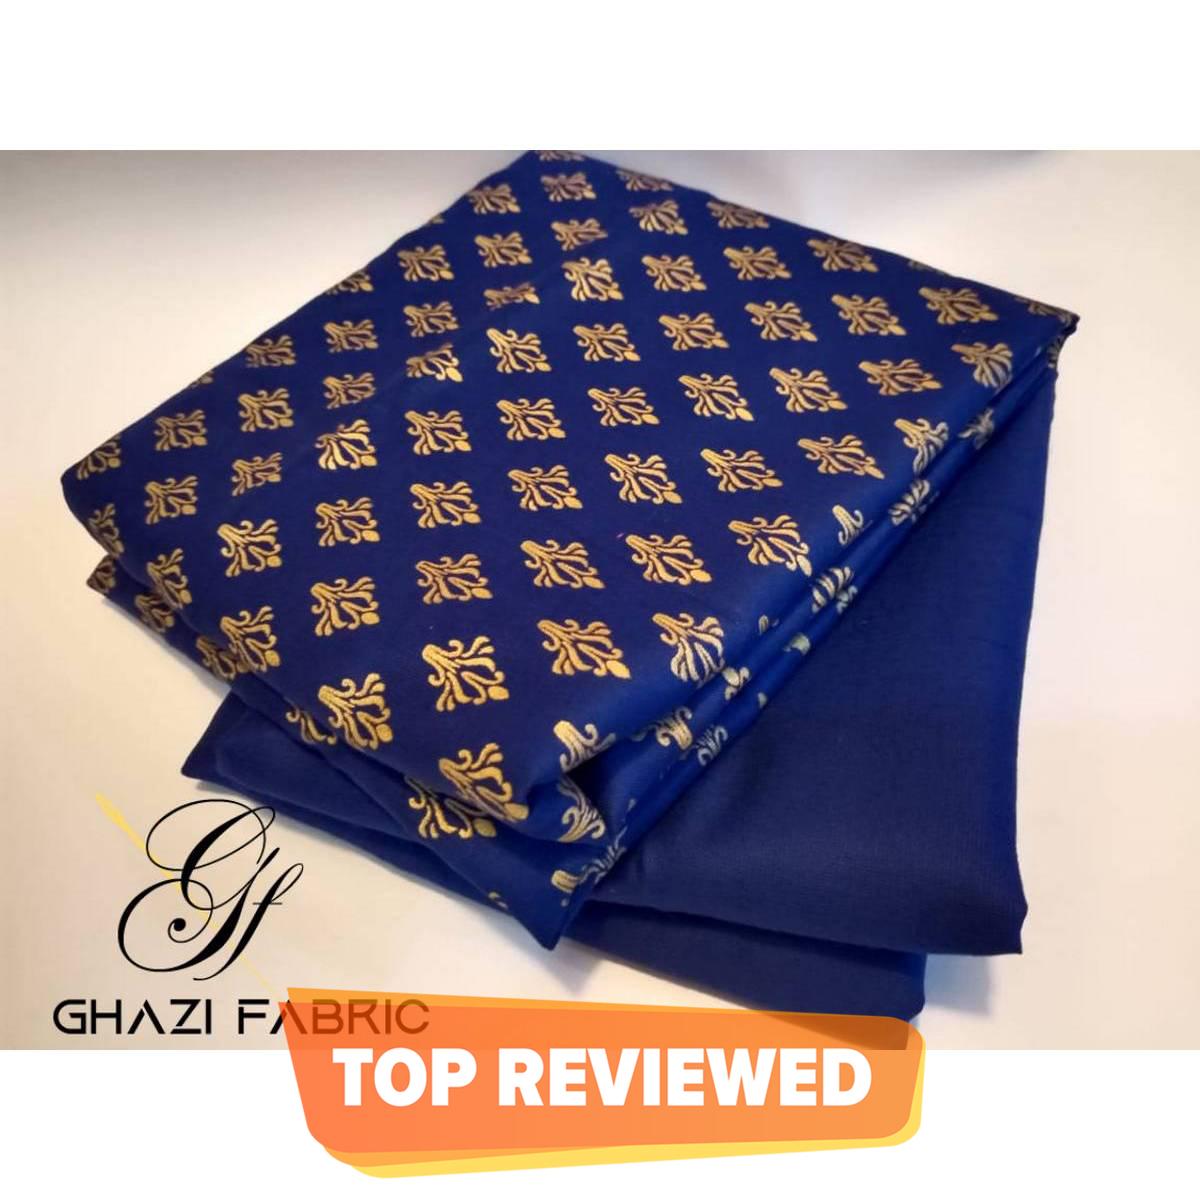 Ghazi fabric  Premium Quality Gold Printed Fabric linen collection unstich printed shirt & plain trouser Fabric 2 pc Royal blue  (gf3433)